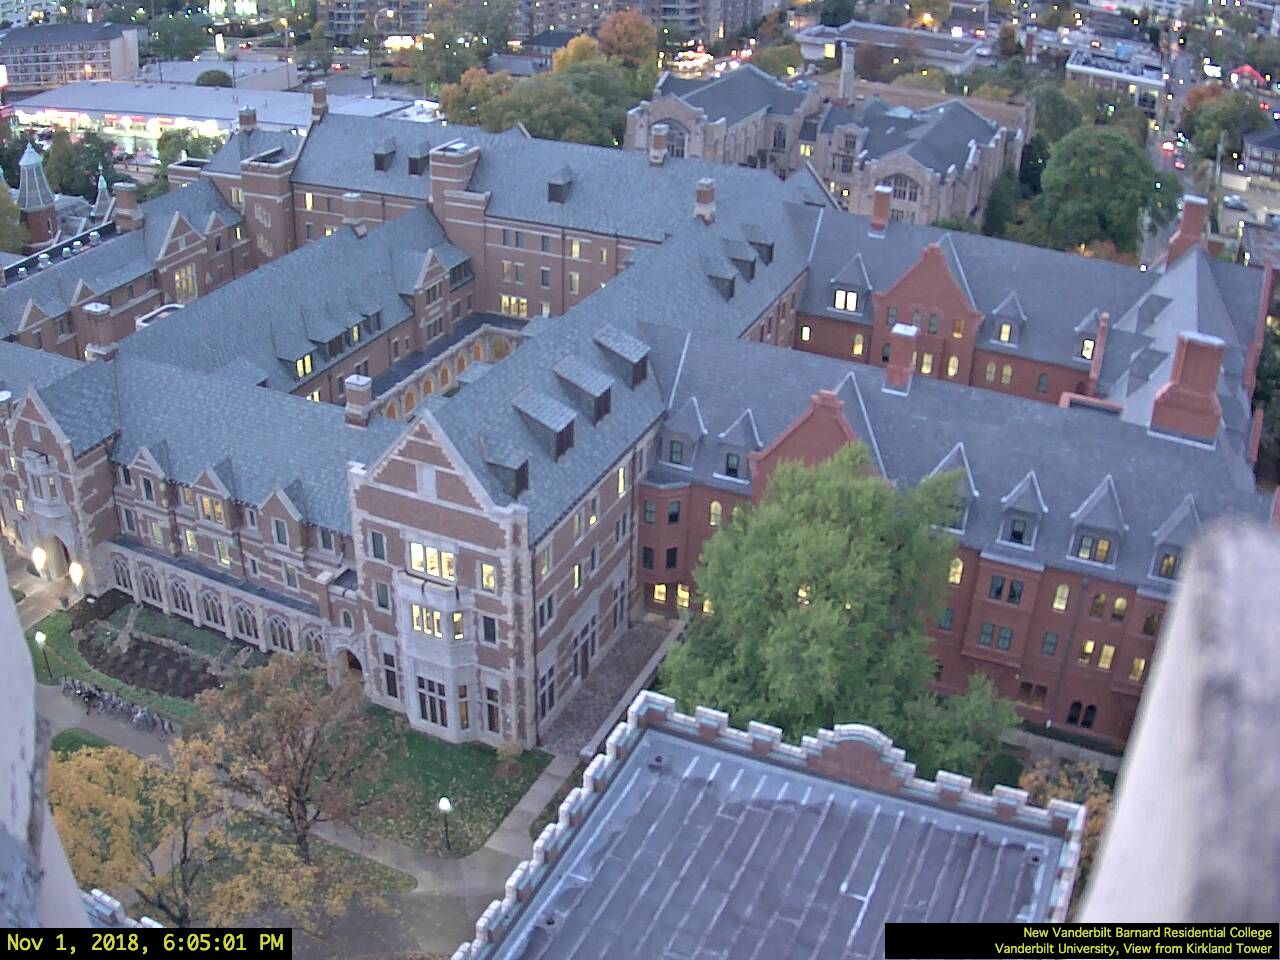 E. Bronson Ingram College